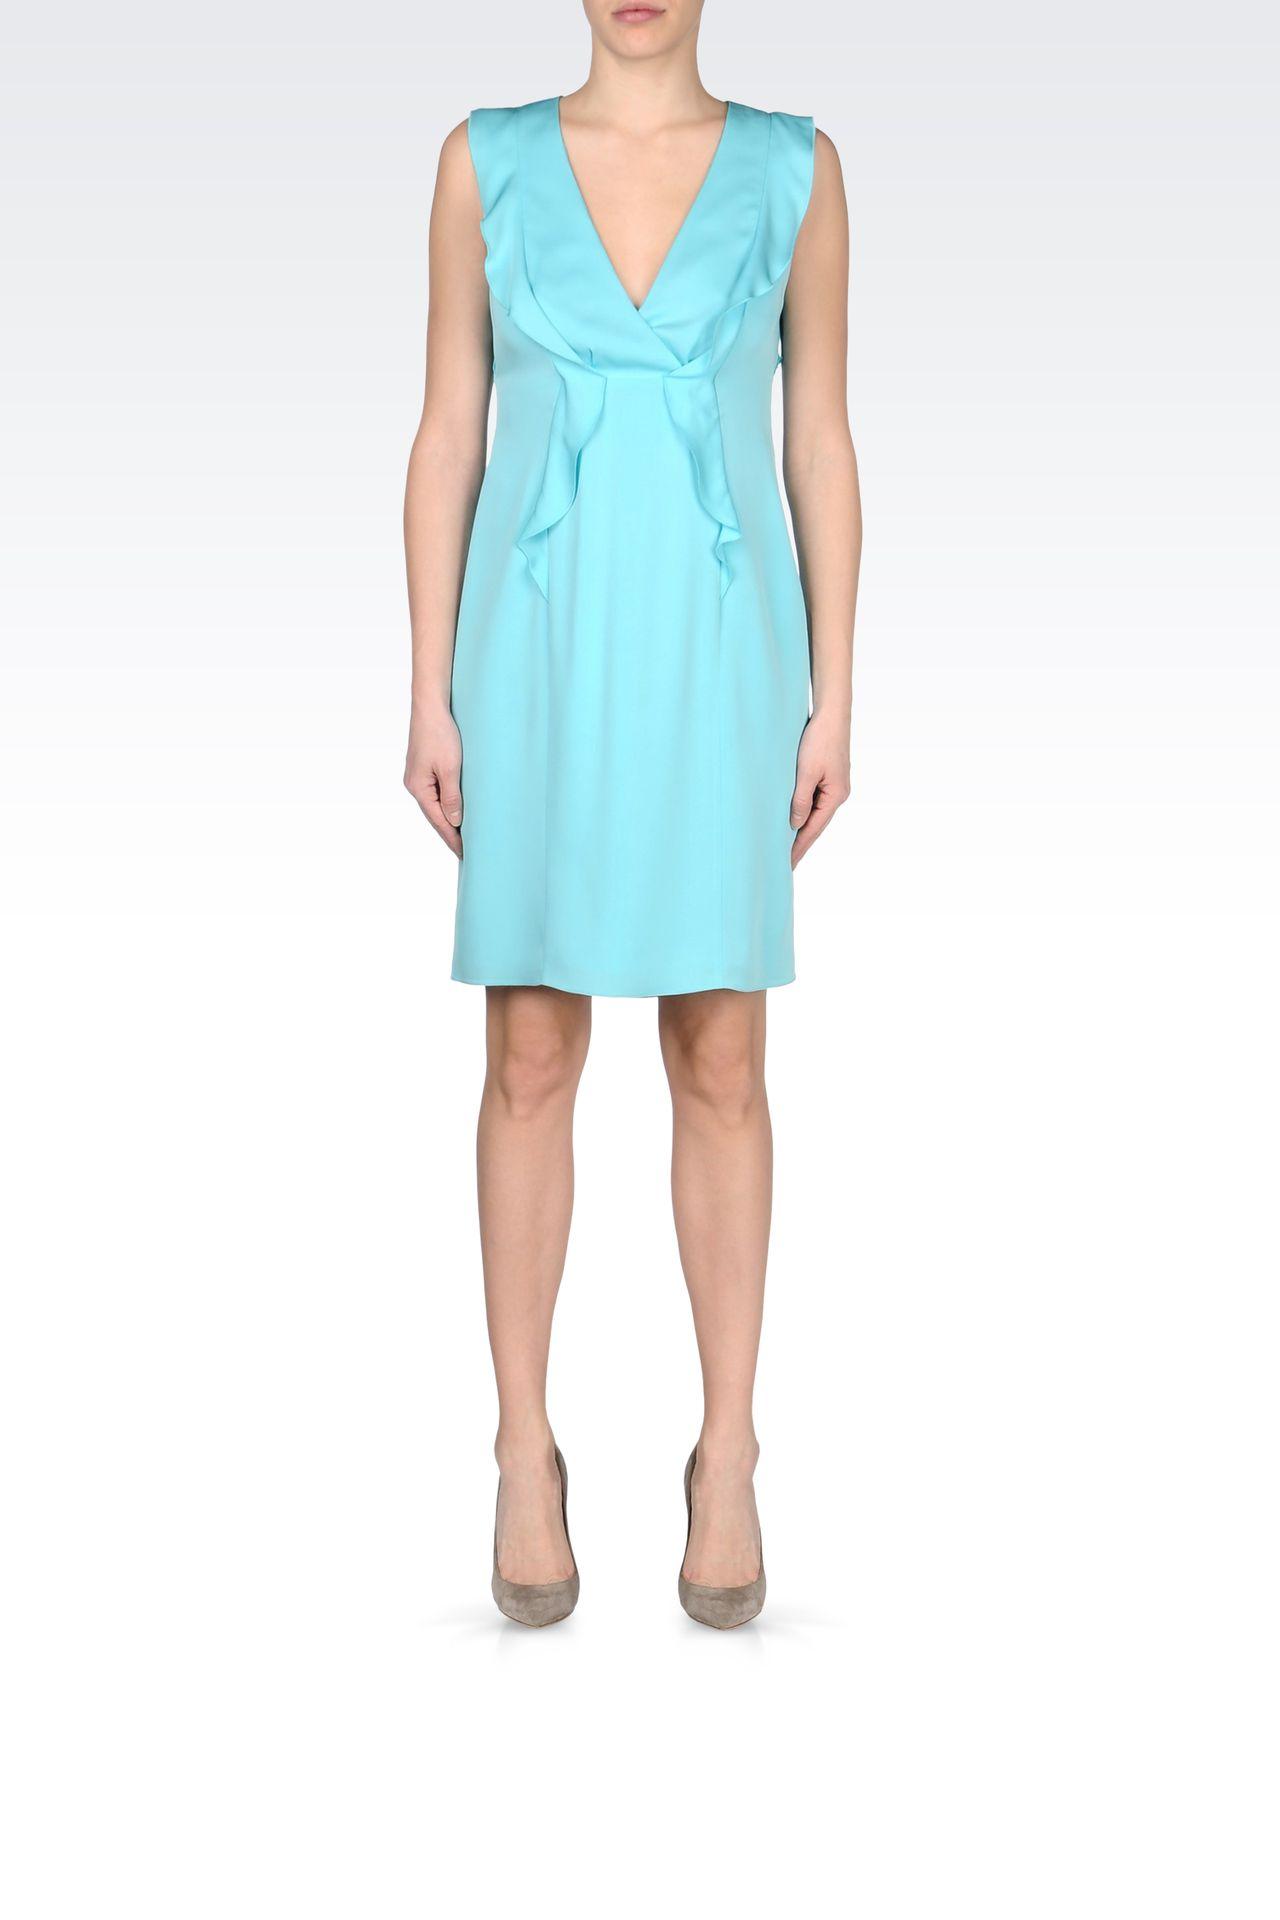 CADY SILK DRESS WITH RUFFLE: Short Dresses Women by Armani - 0